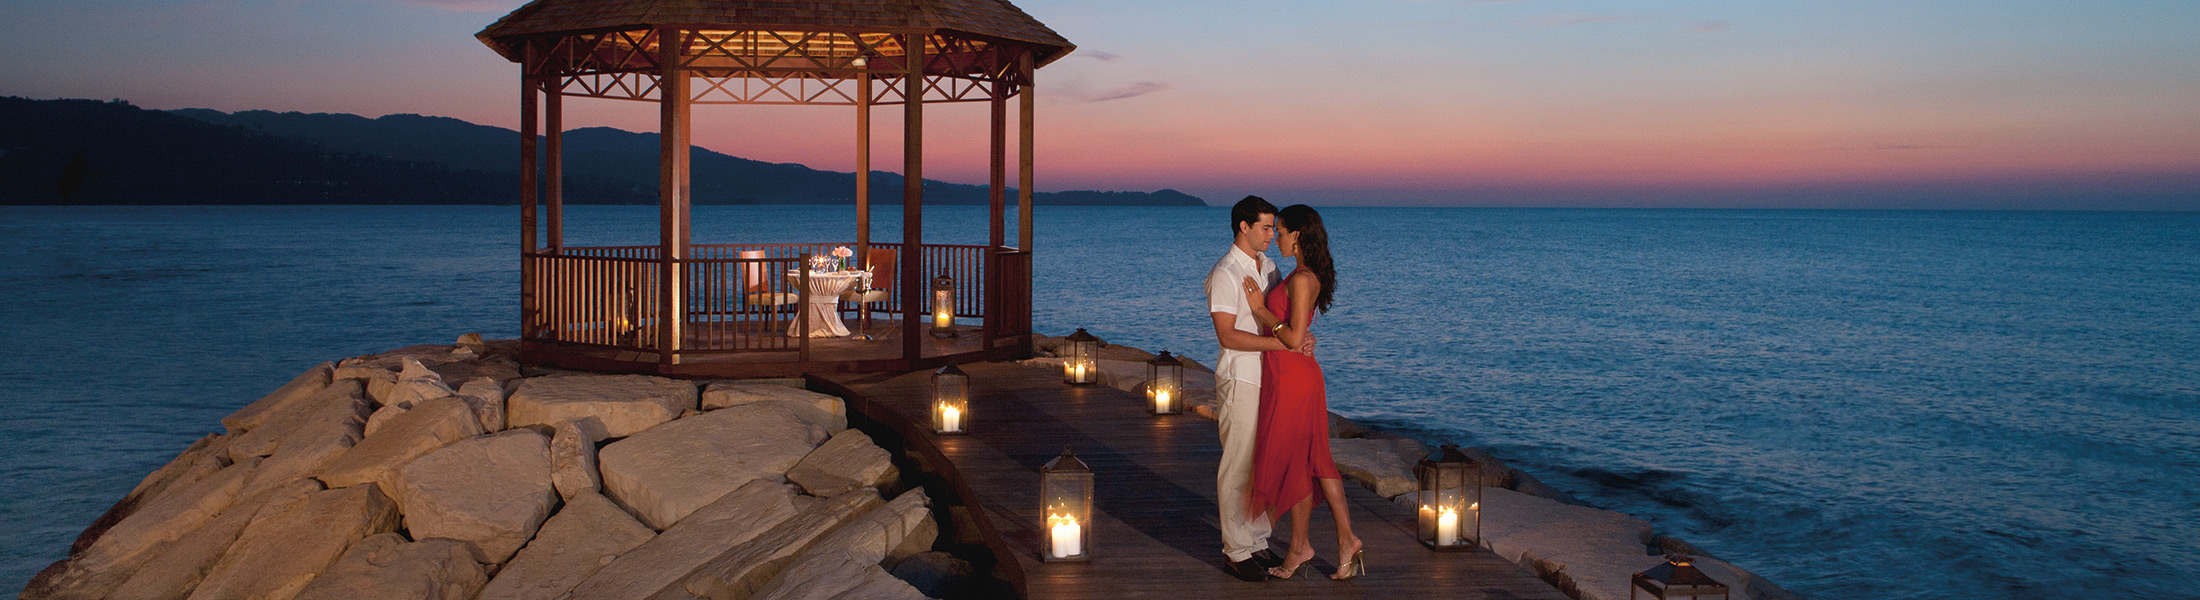 Couple at sunset in a beachfront gazebo dinner at Secrets St James